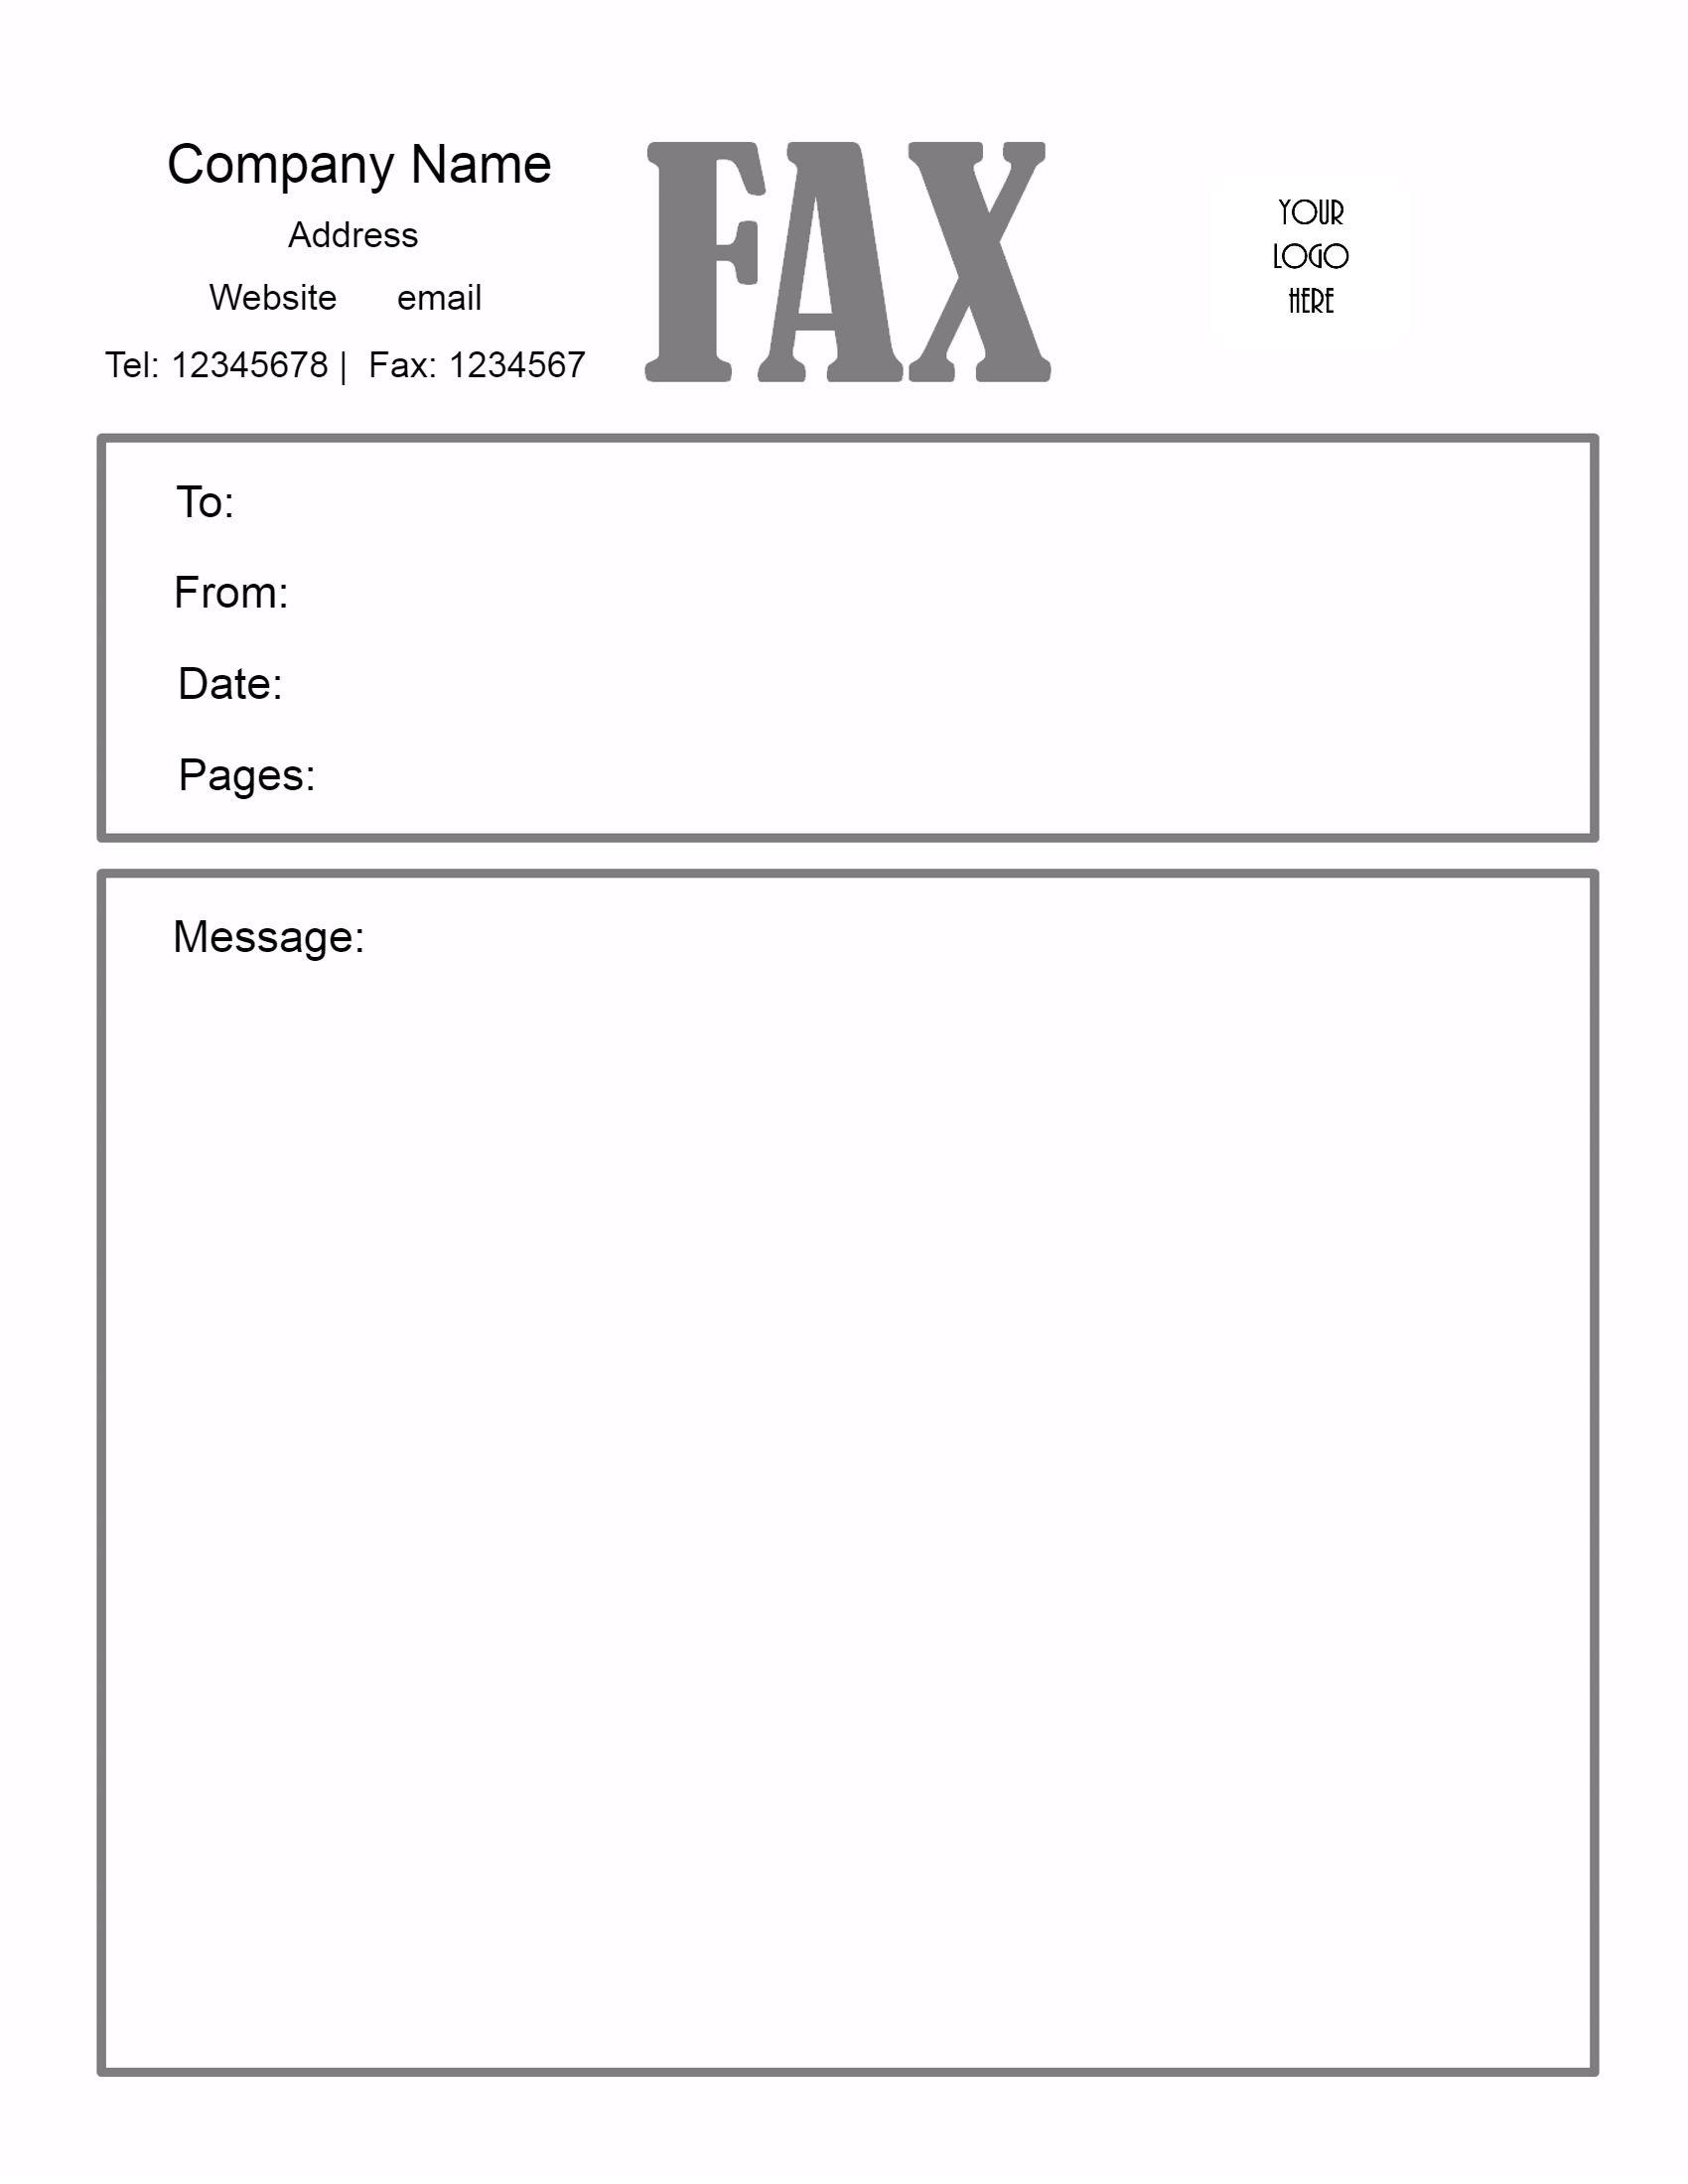 Fax Cover Letter Sample Word Sample Cover Letter